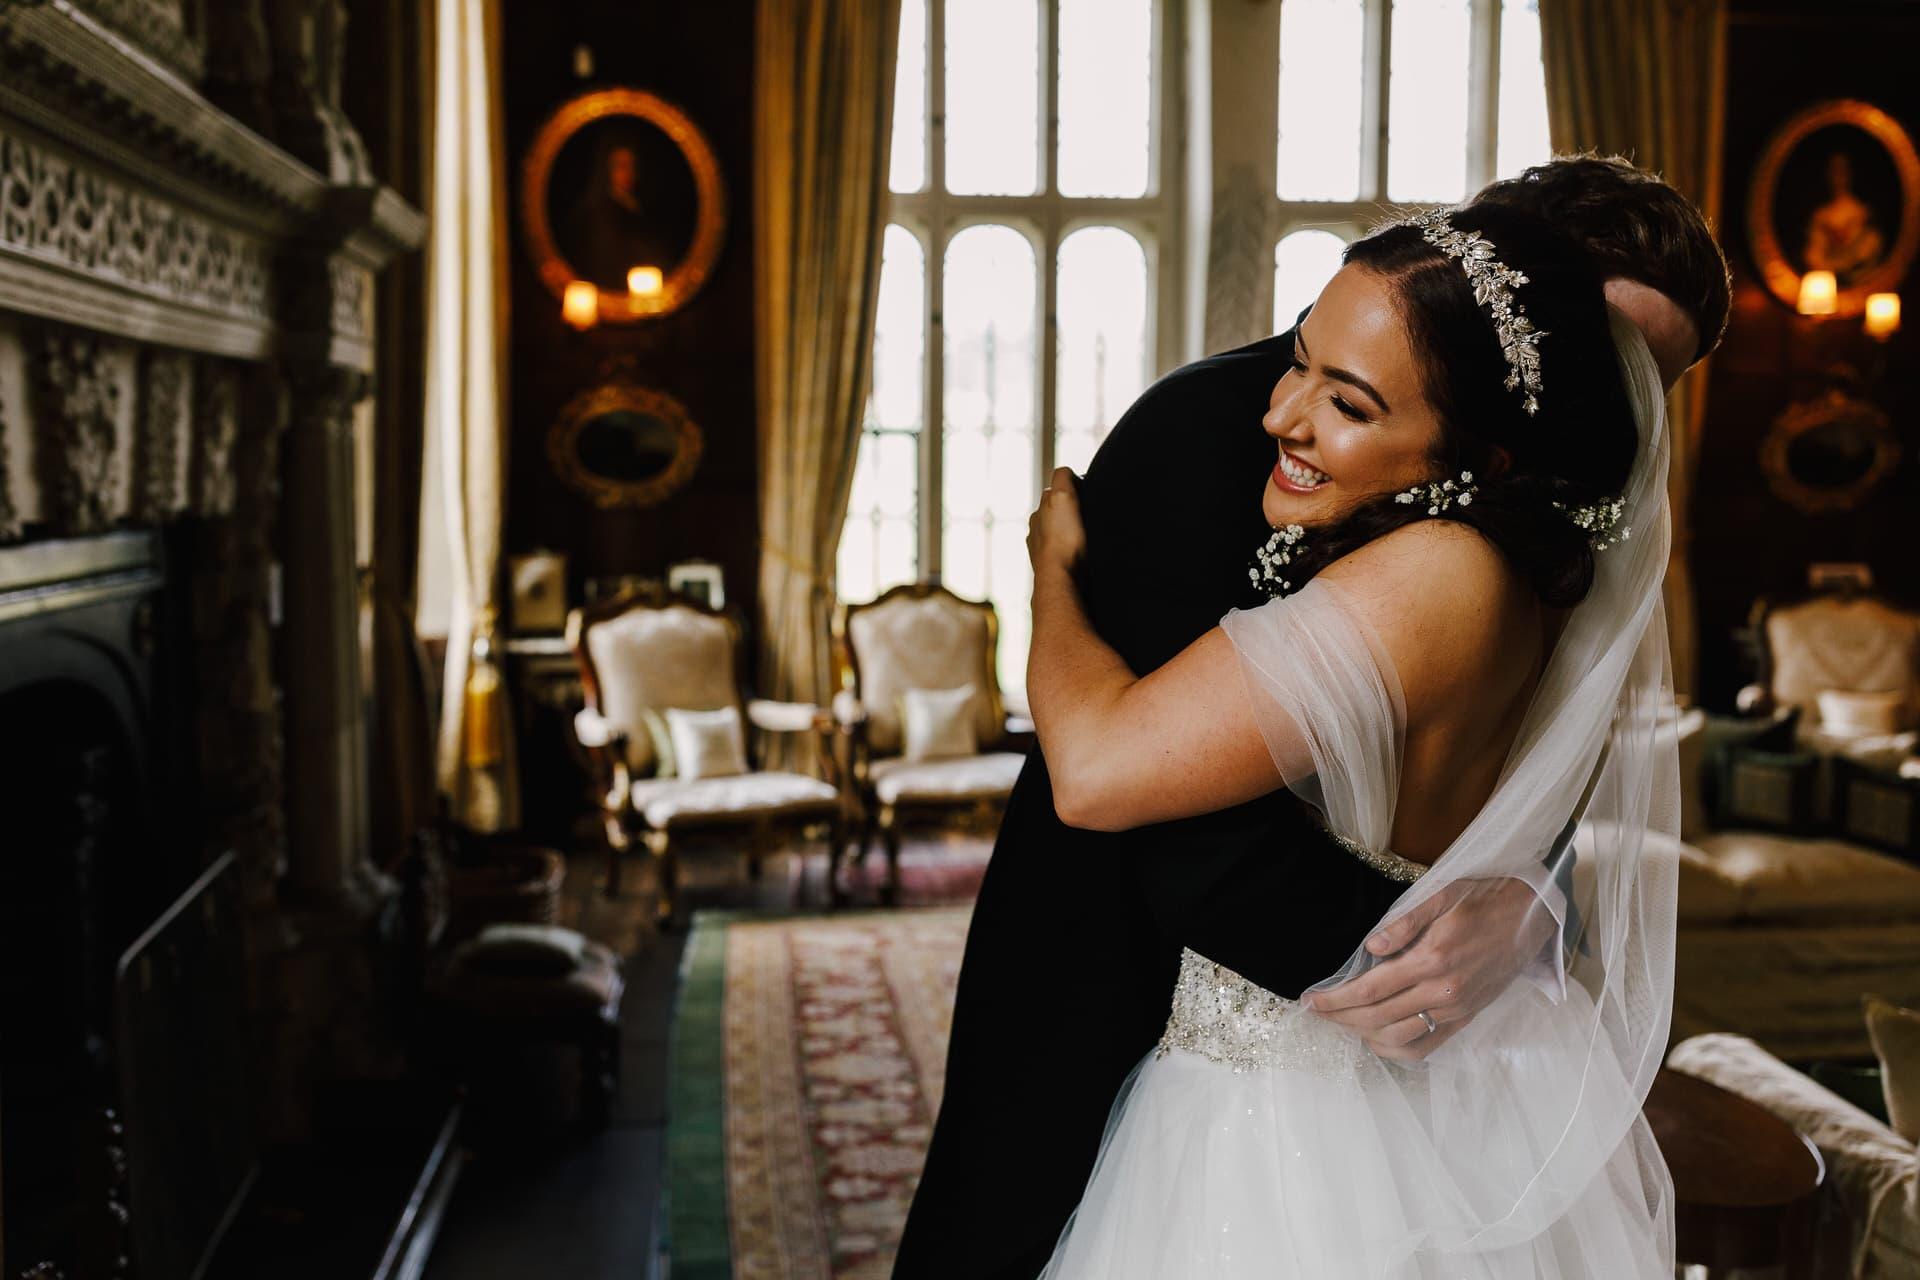 Loseley Park Wedding - Country House wedding in Surrey